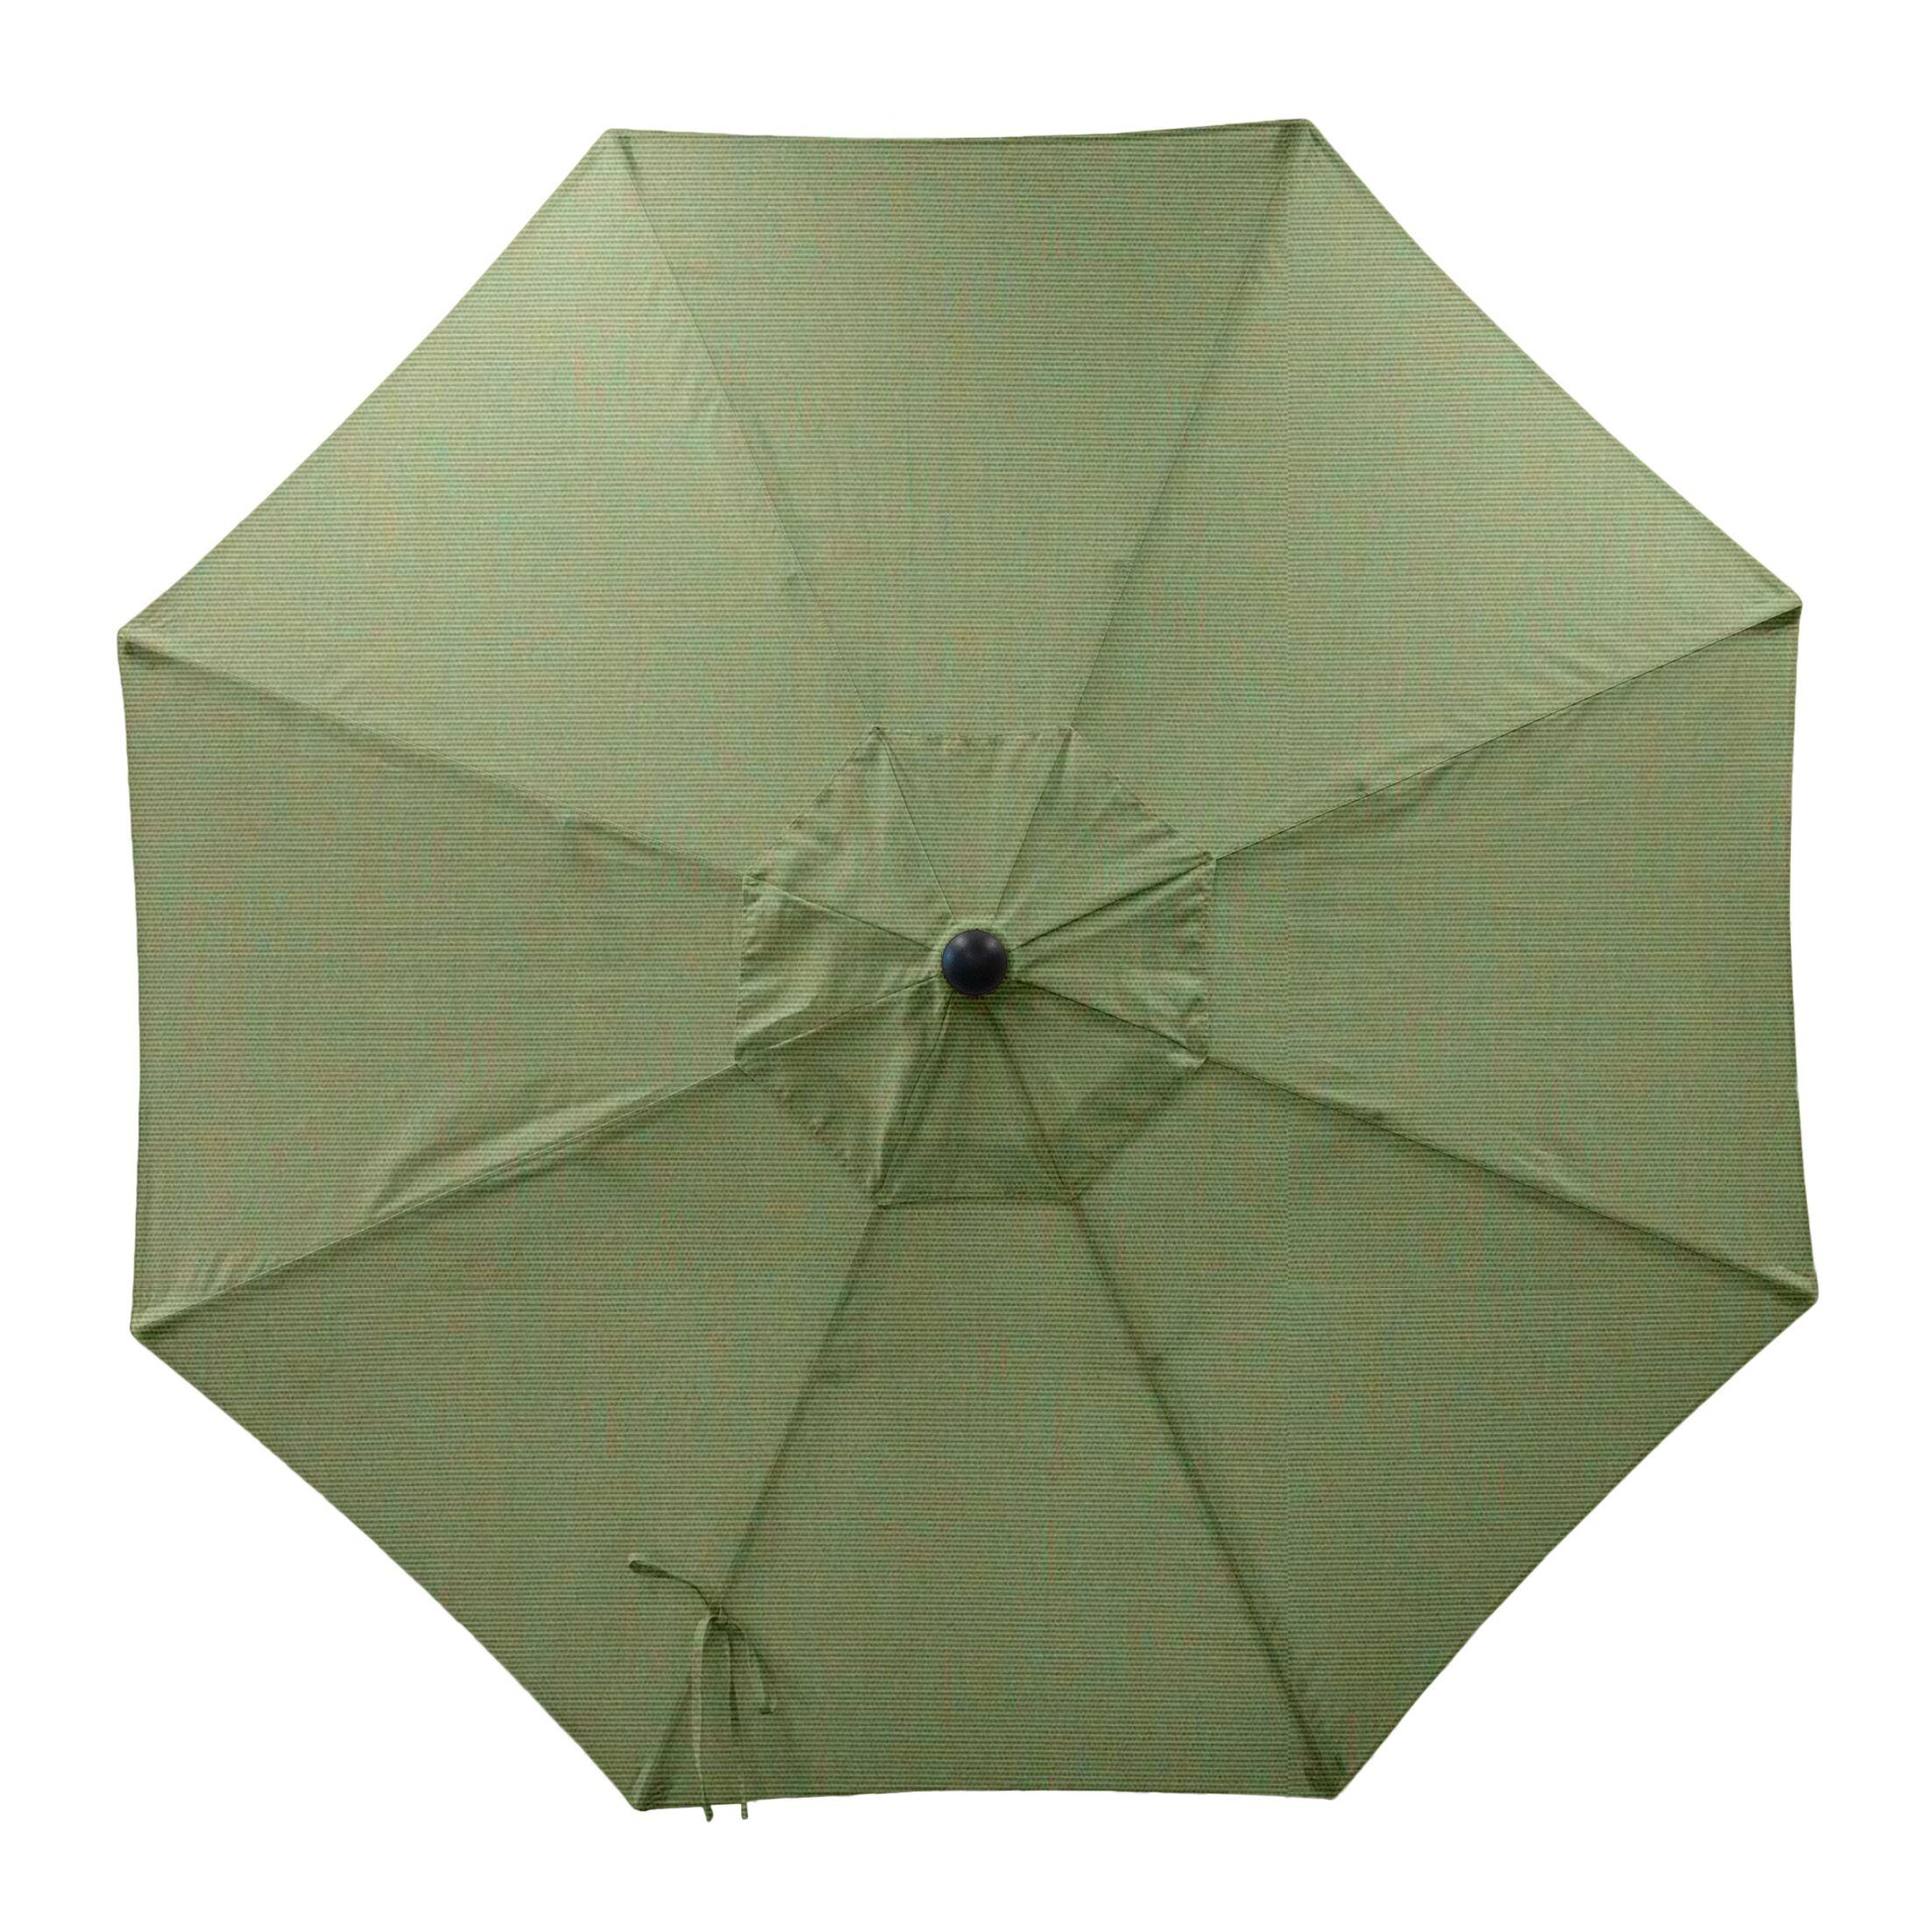 Centeno Double Pulley 9' Market Sunbrella Umbrella Fabric Color: Fern, Frame Color: Silver Mirror